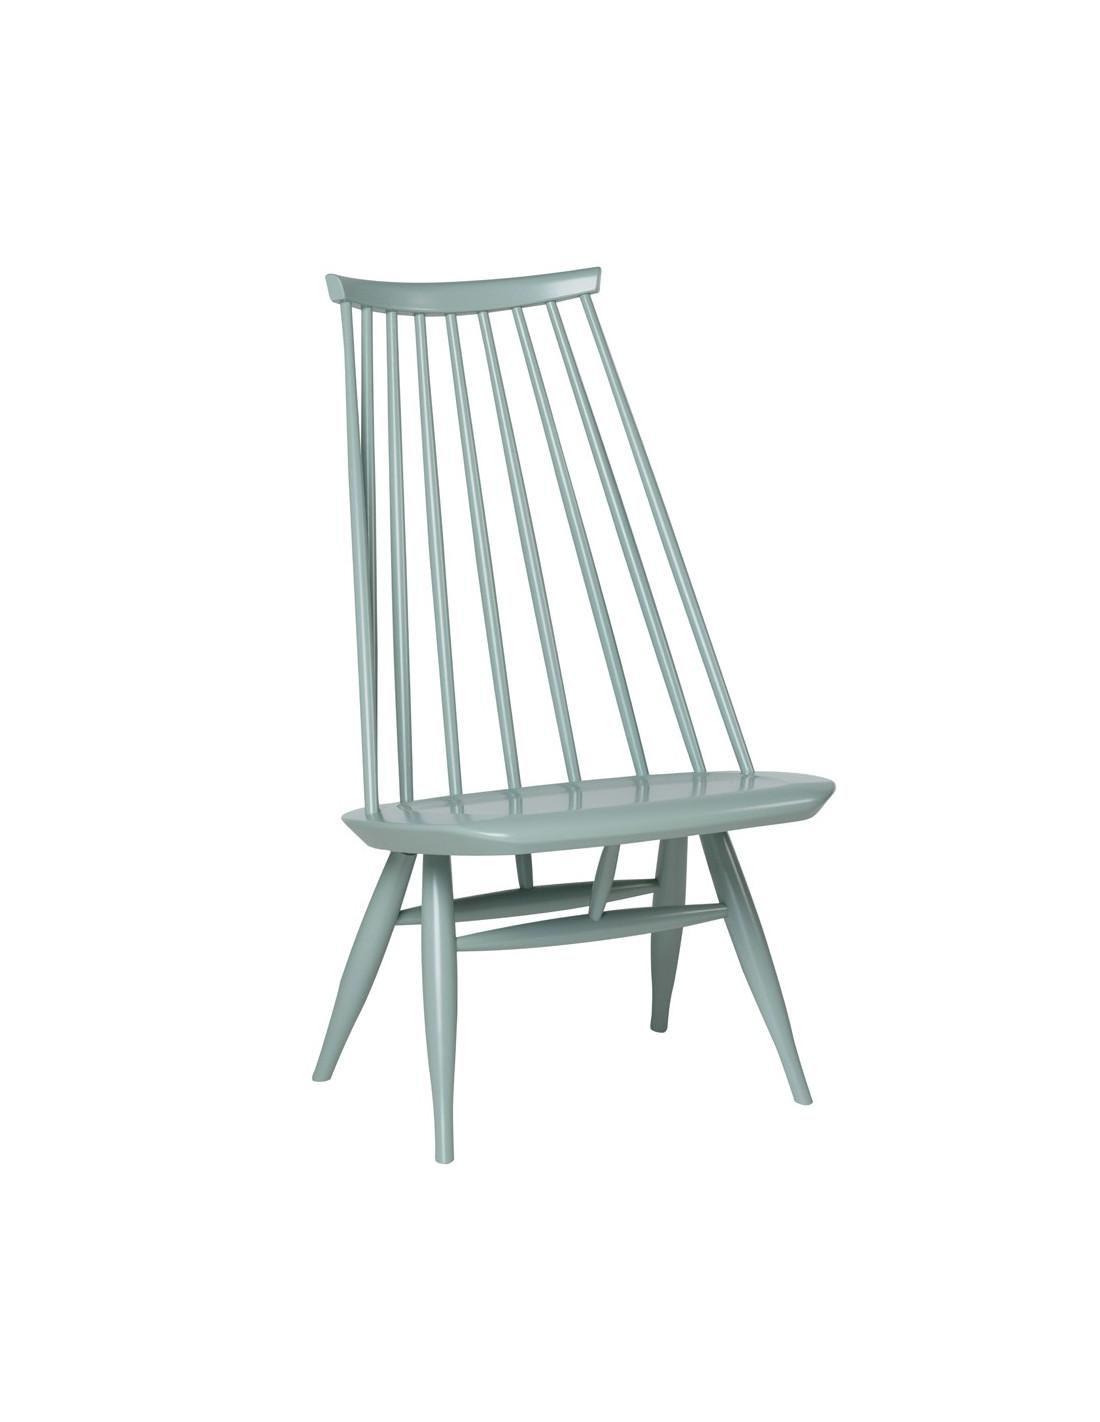 Mademoiselle chaise design ilmari tapiovaara pour artek la boutique danoise - Chaise danoise design ...